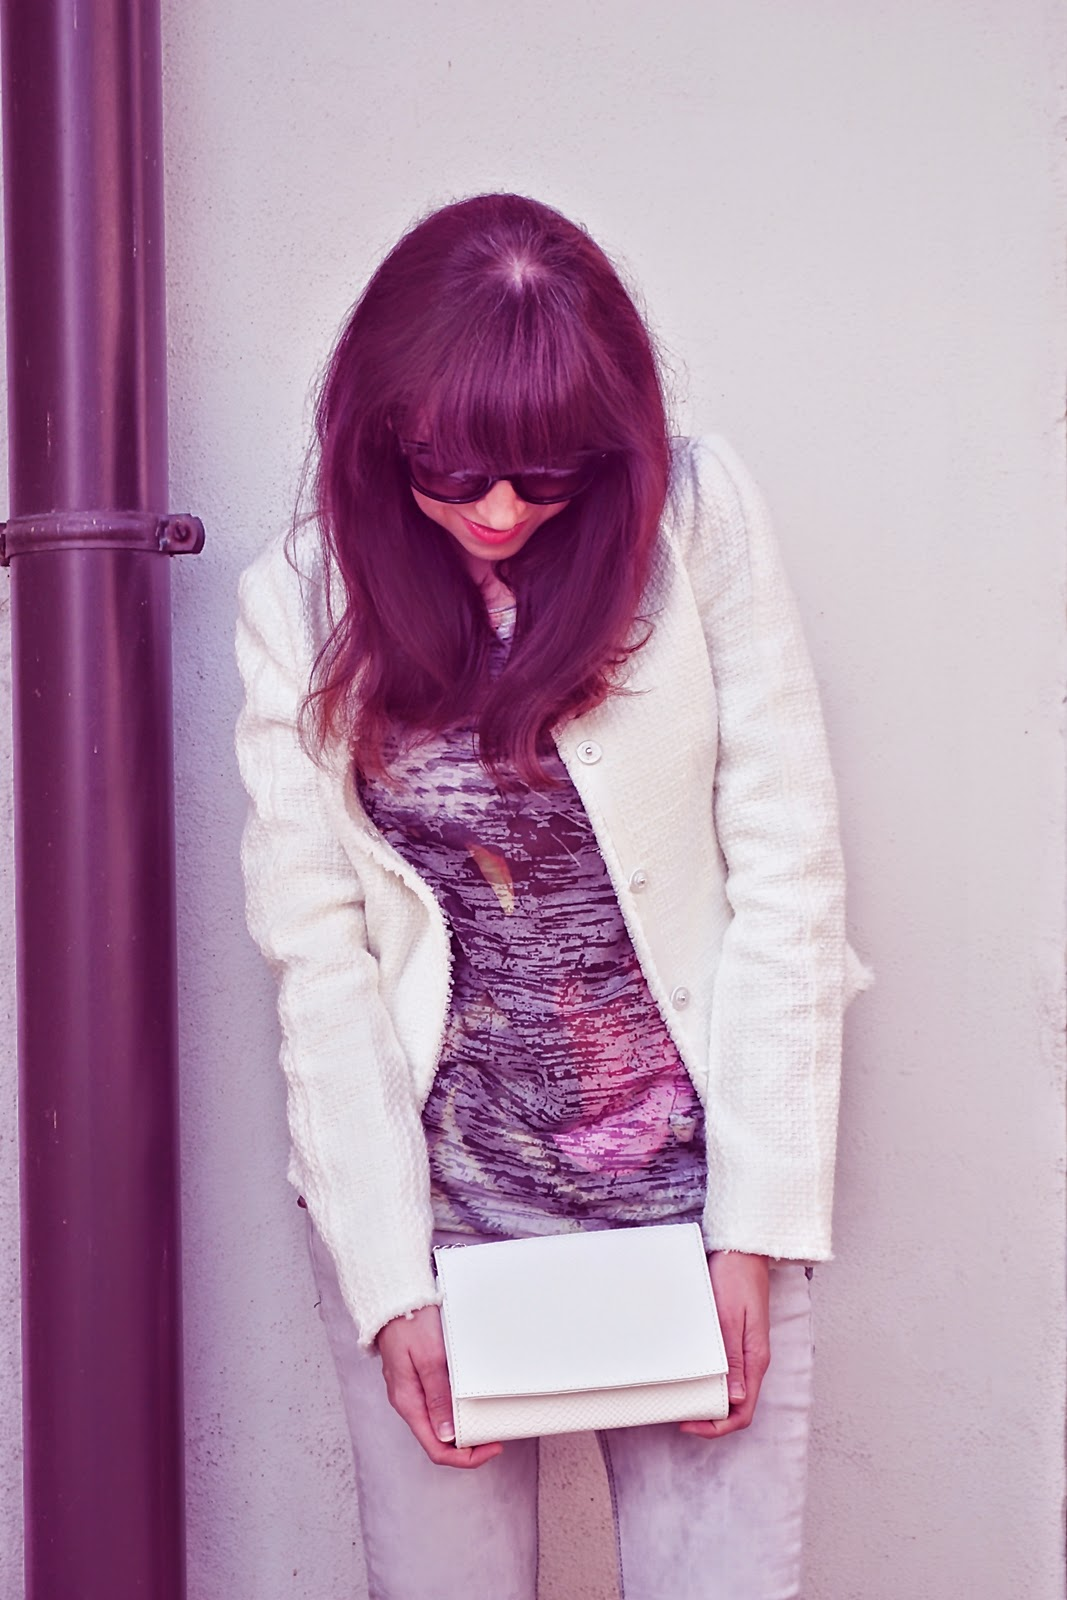 Fashion has no boundaries Katharine-fashion is beautiful